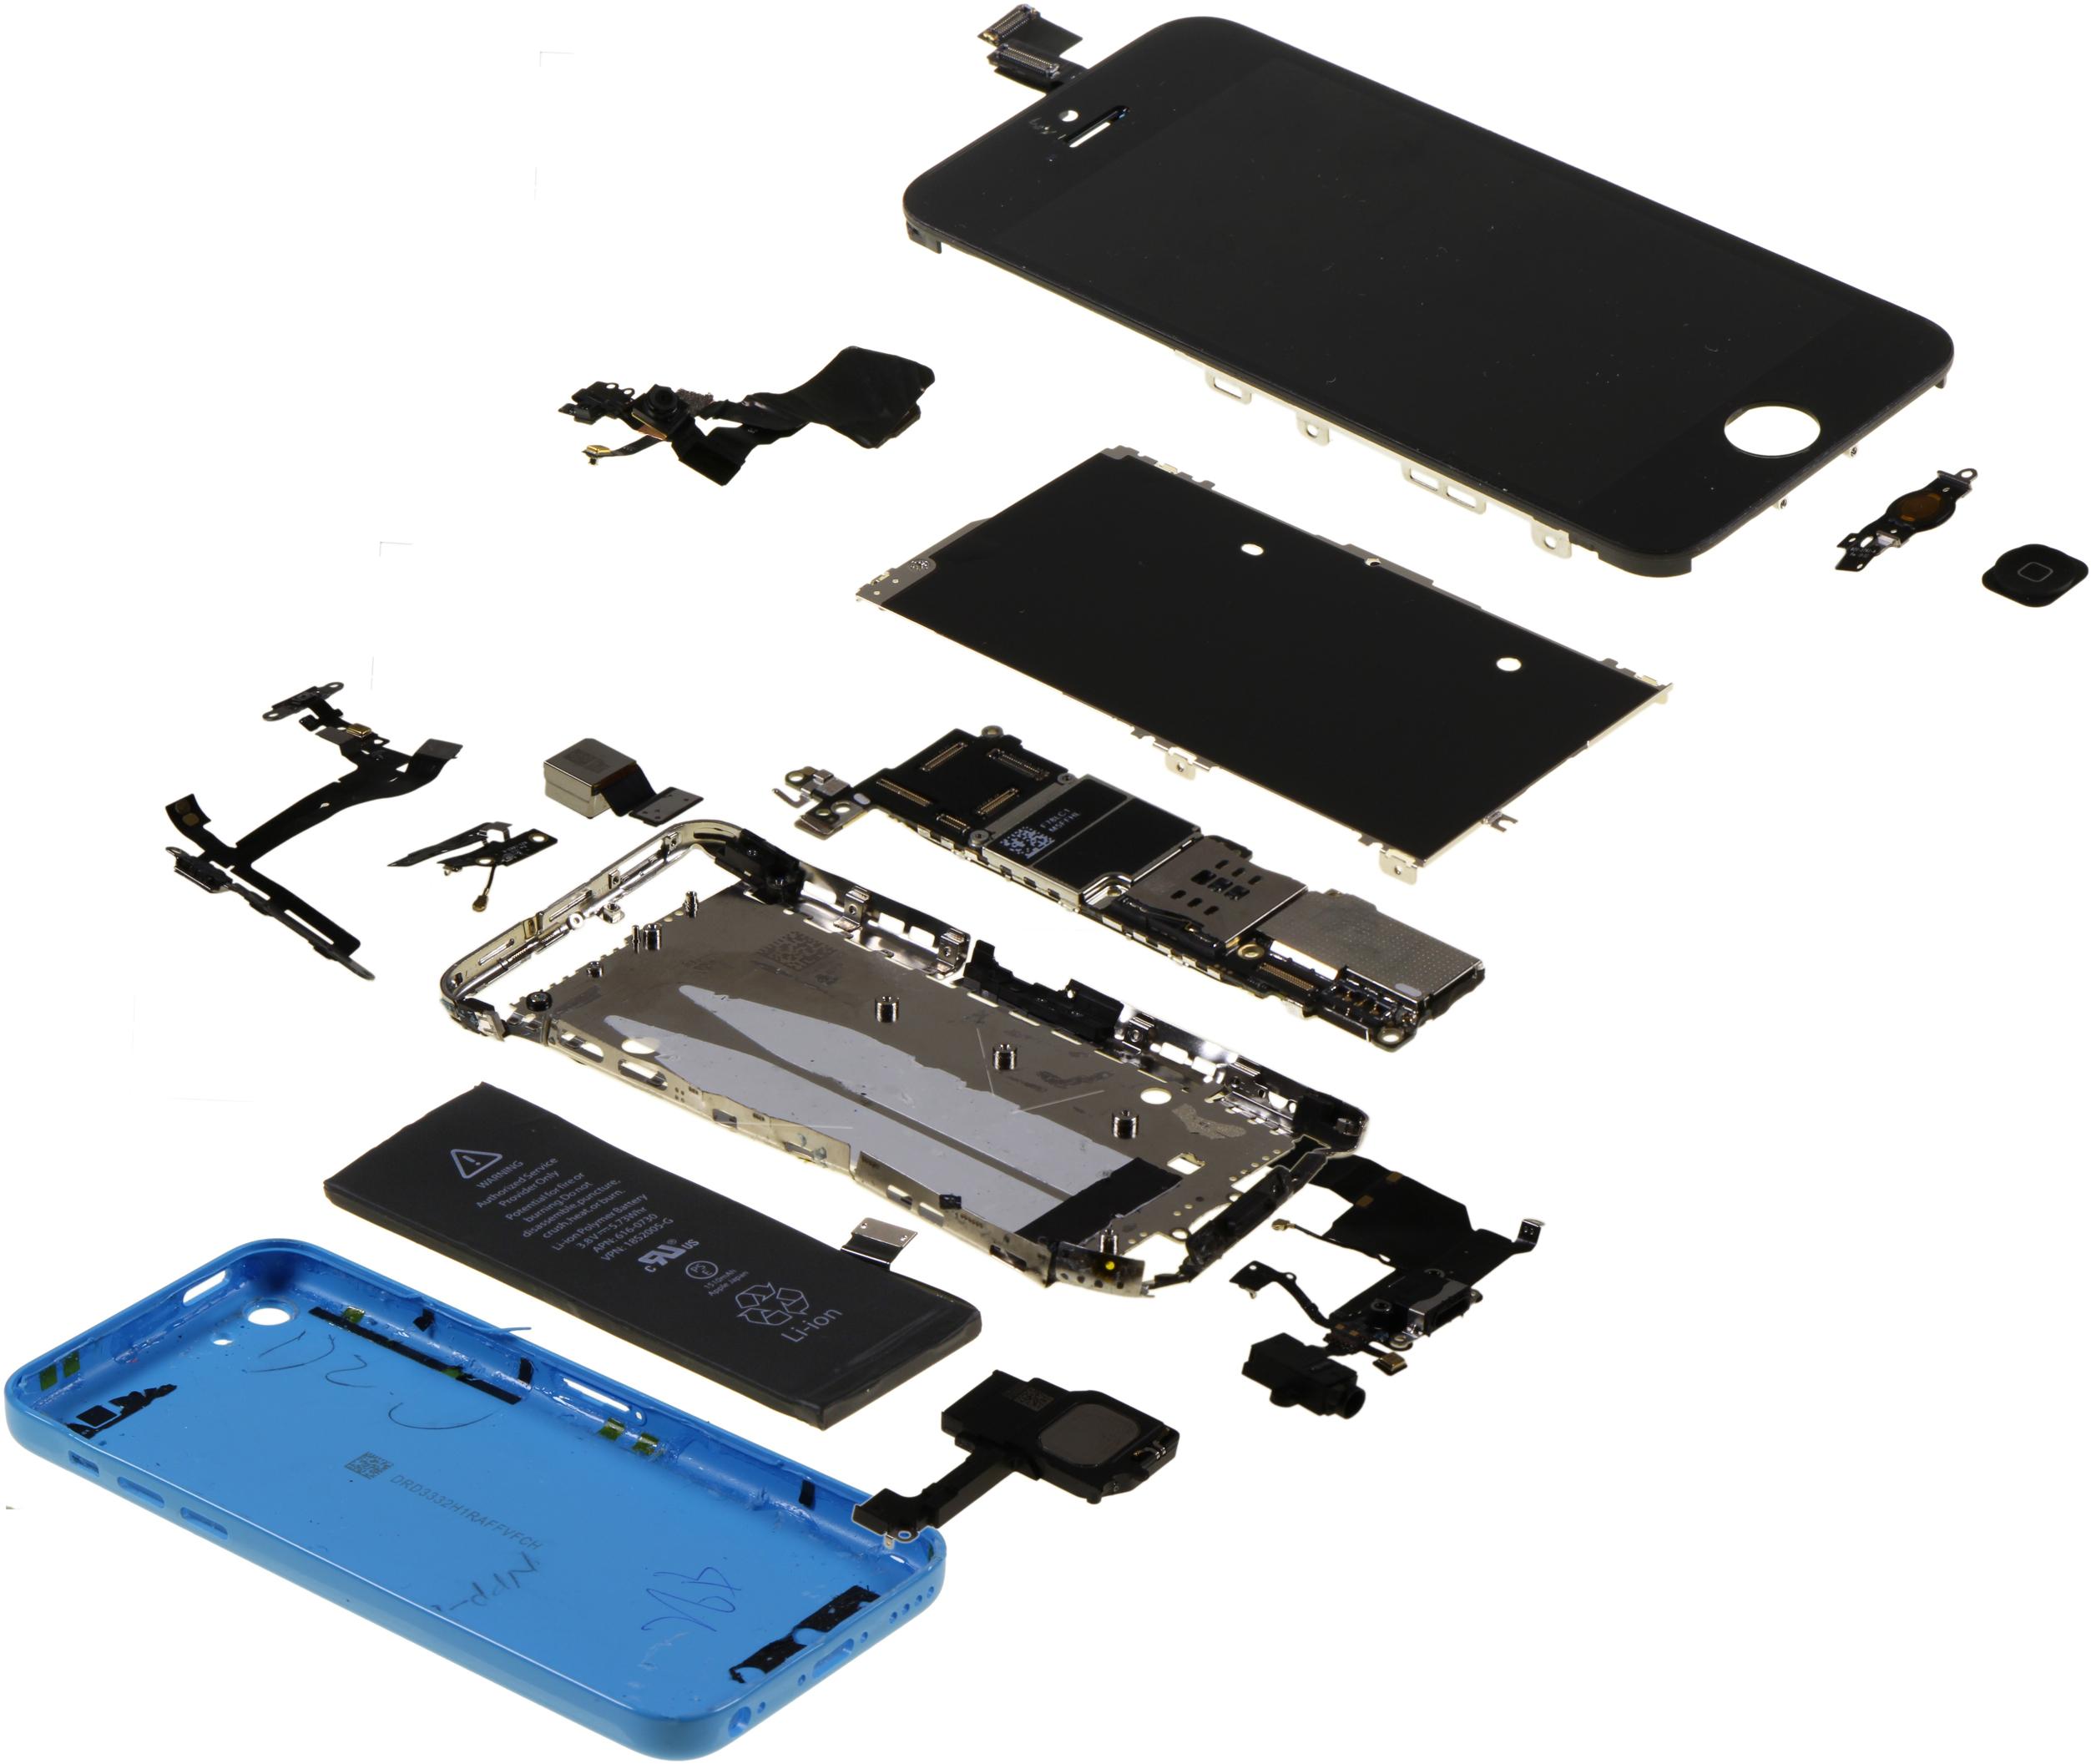 iPhone 5c desmontado pela IHS